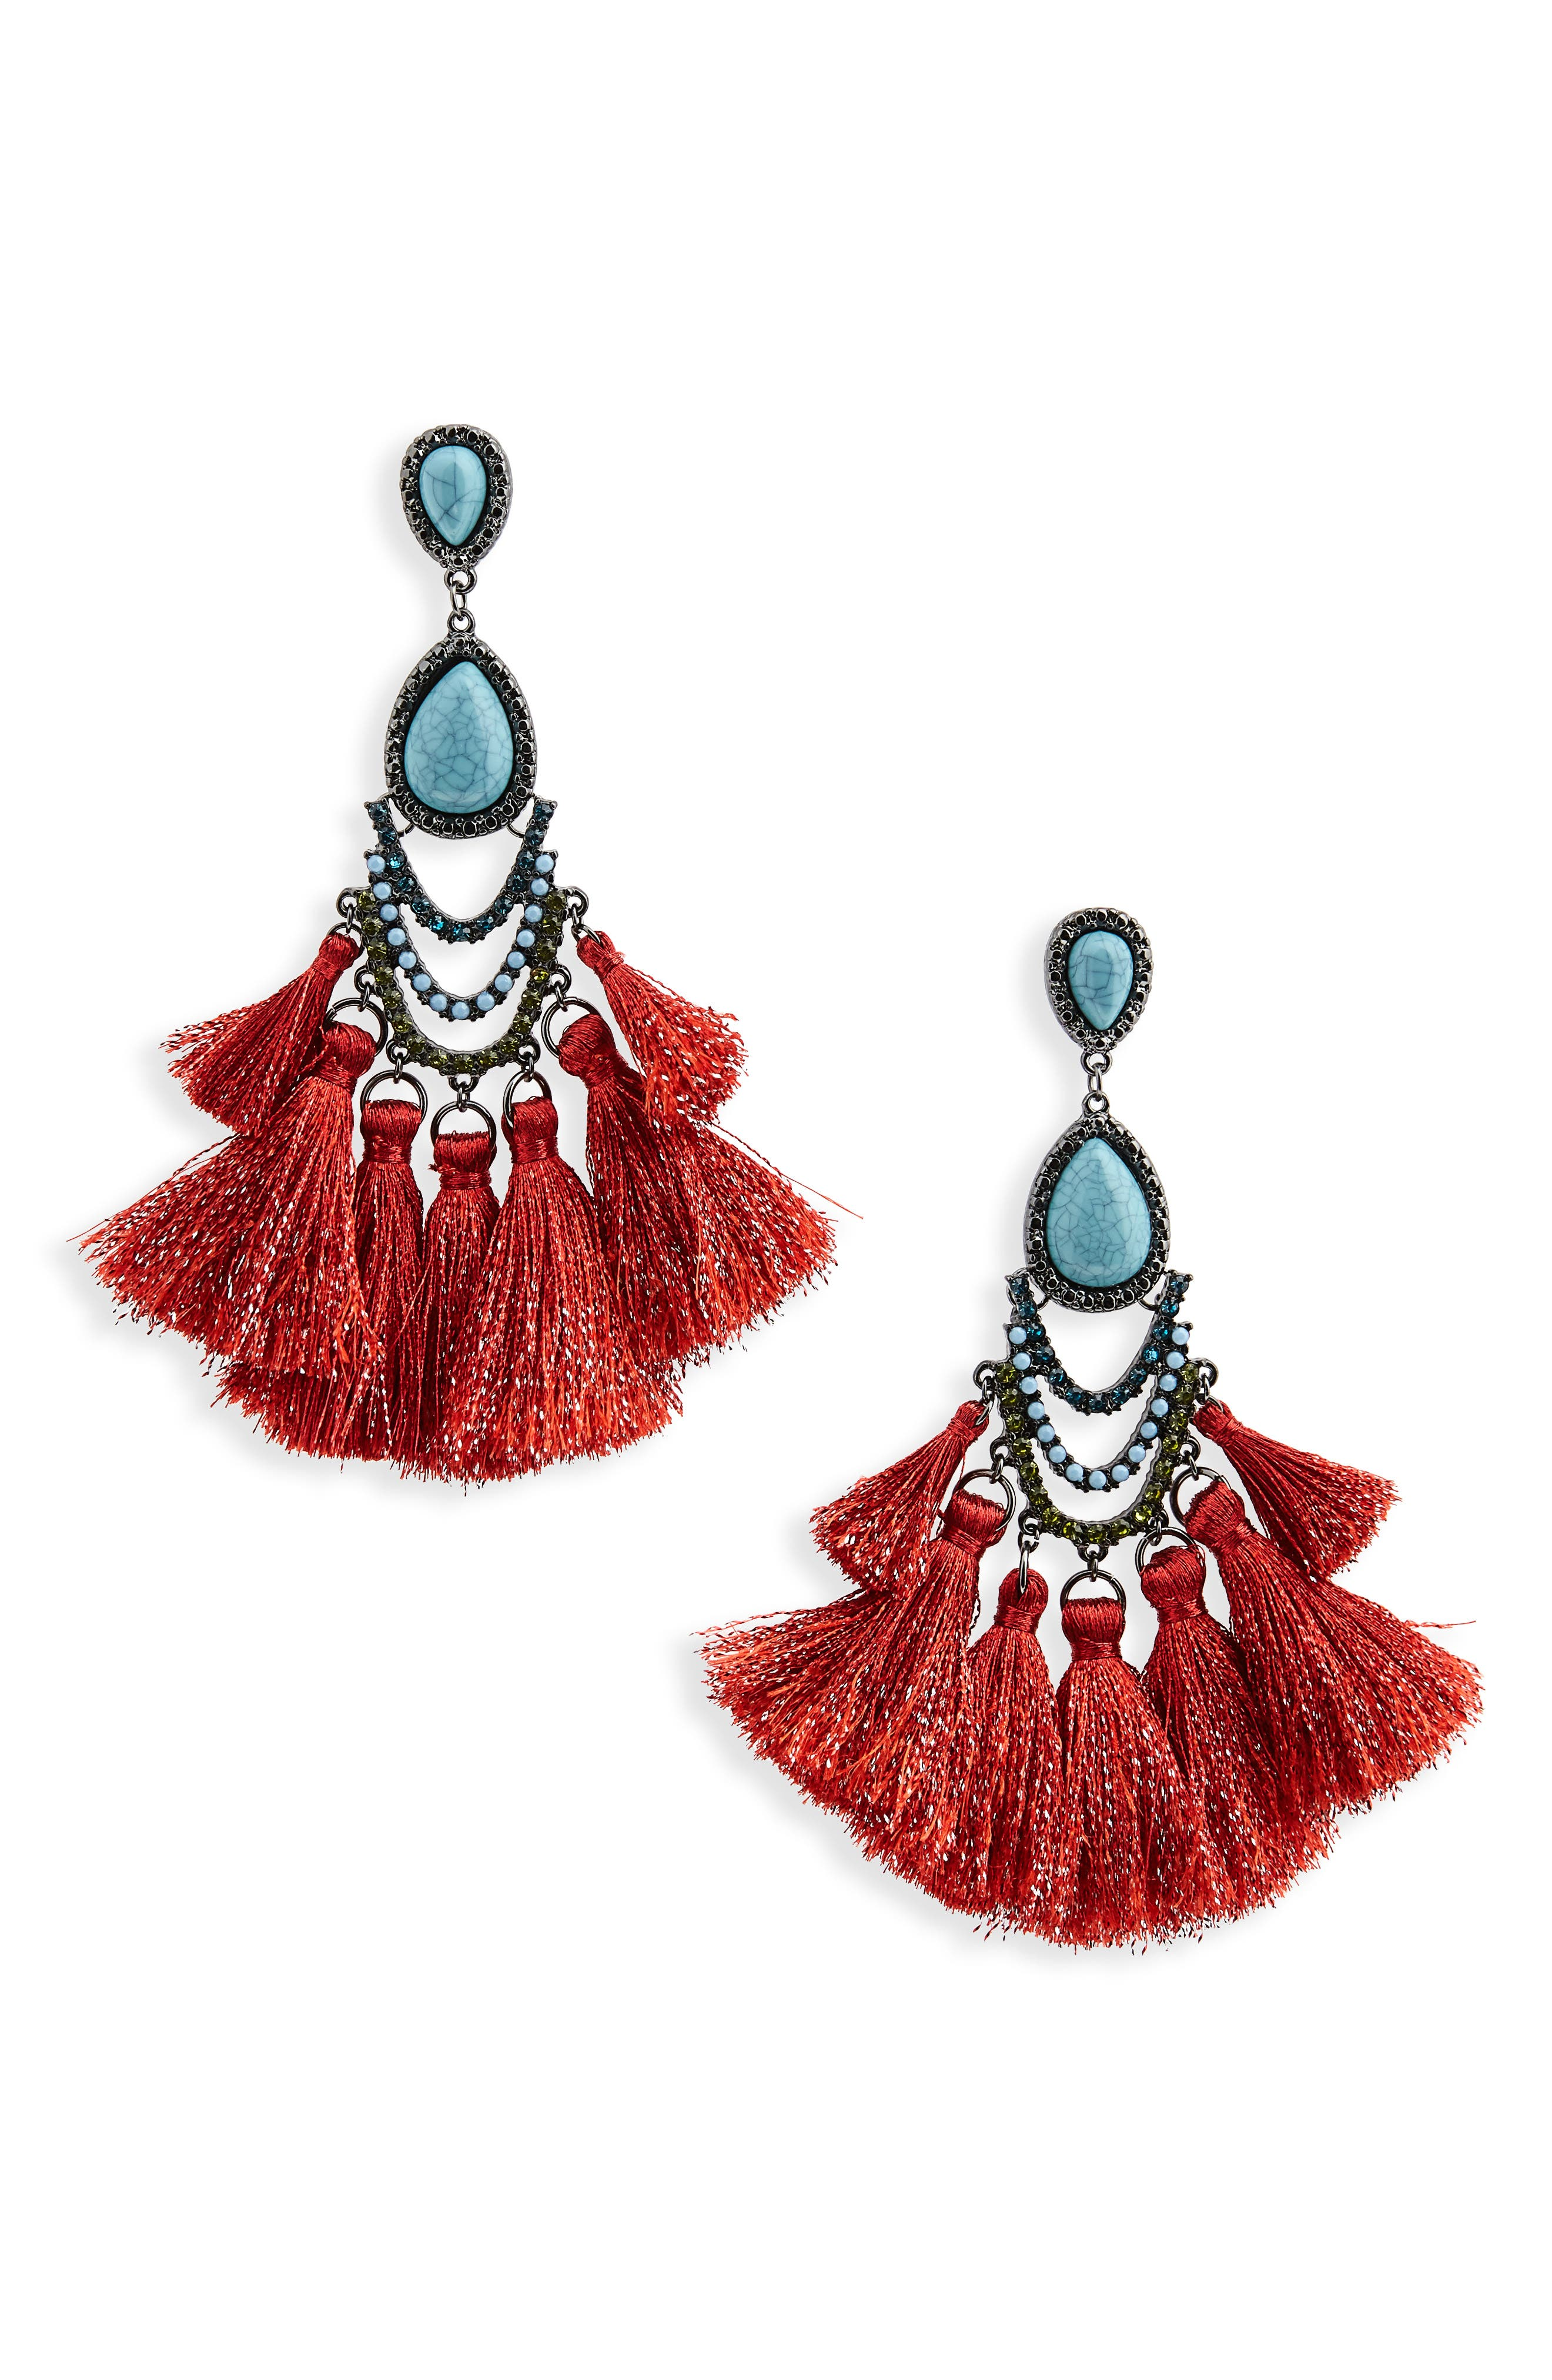 Tassel Drop Earrings,                             Main thumbnail 1, color,                             TEAL/ RED/ MULTI